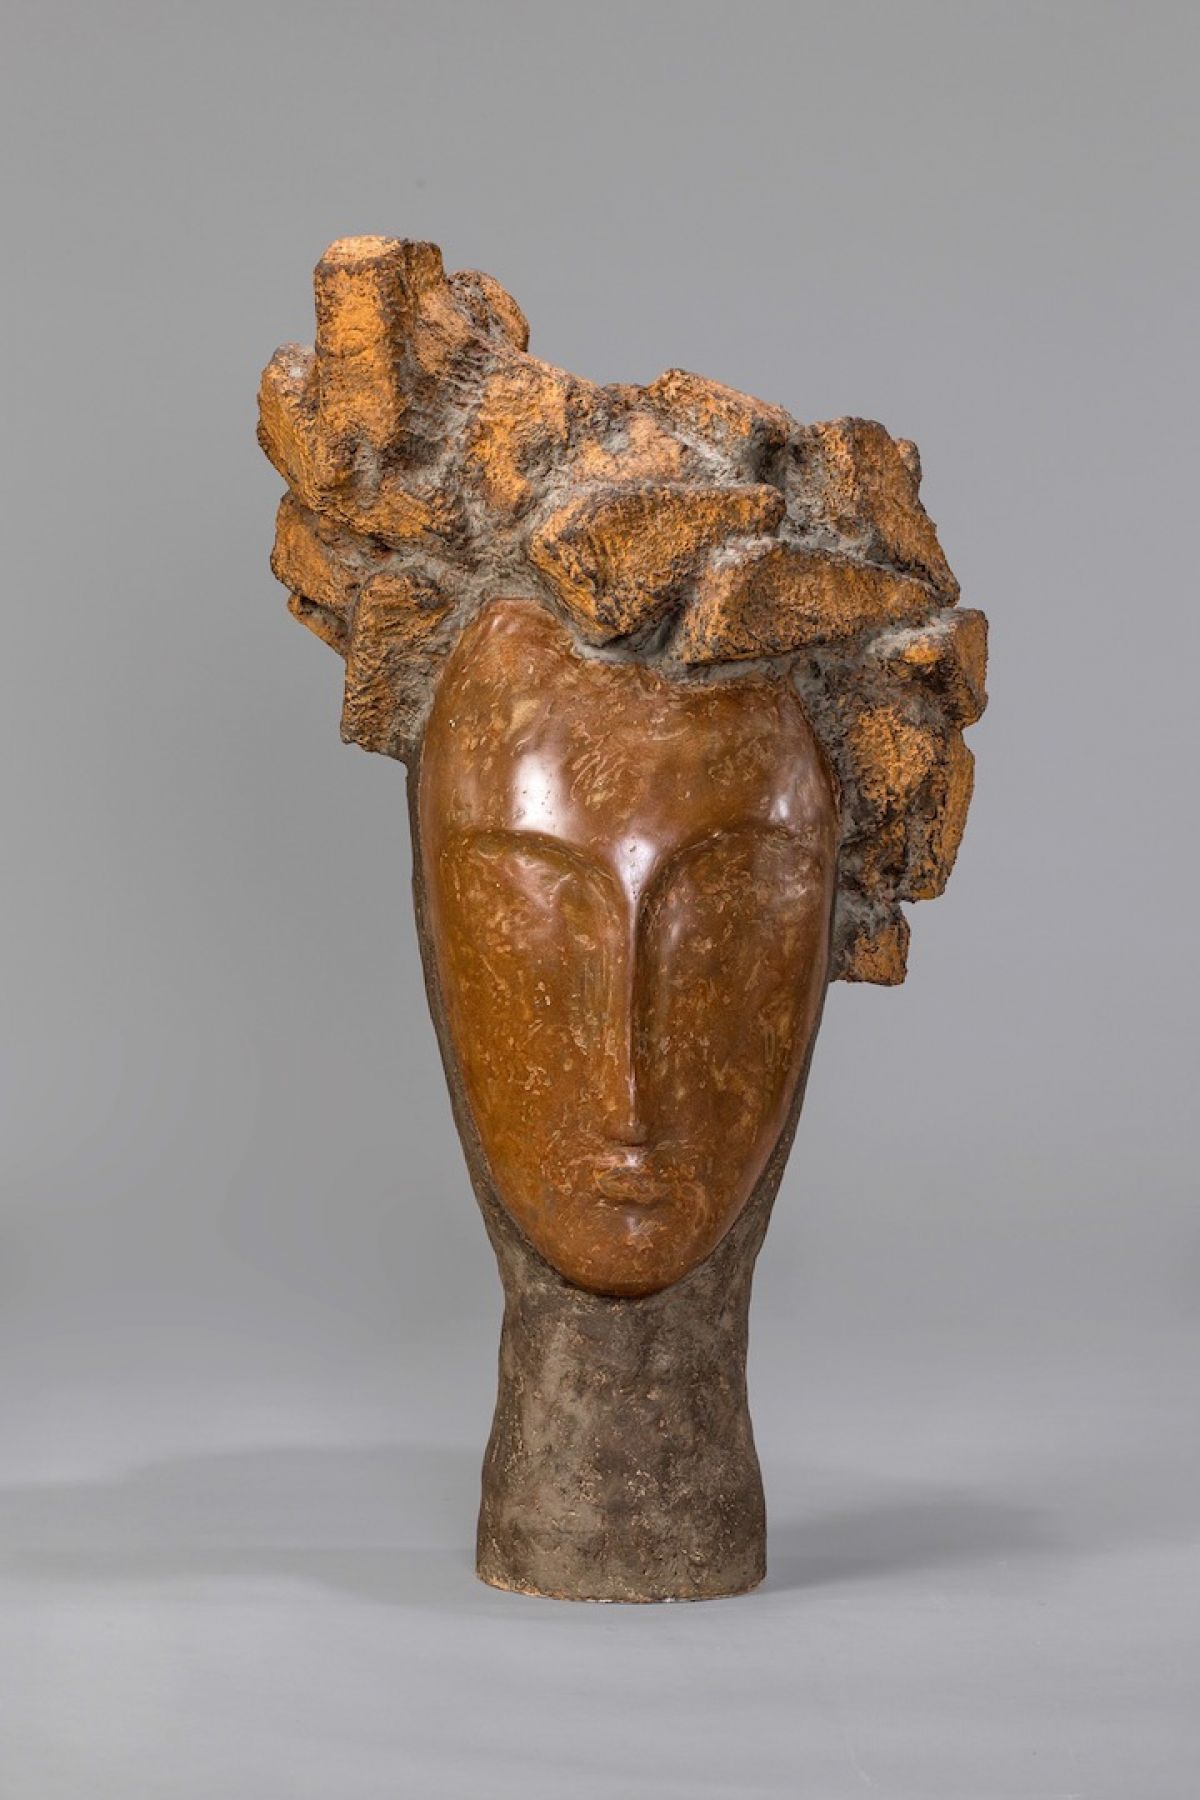 Kunst: Artemis, in search of meaning van kunstenaar Diana Joseph